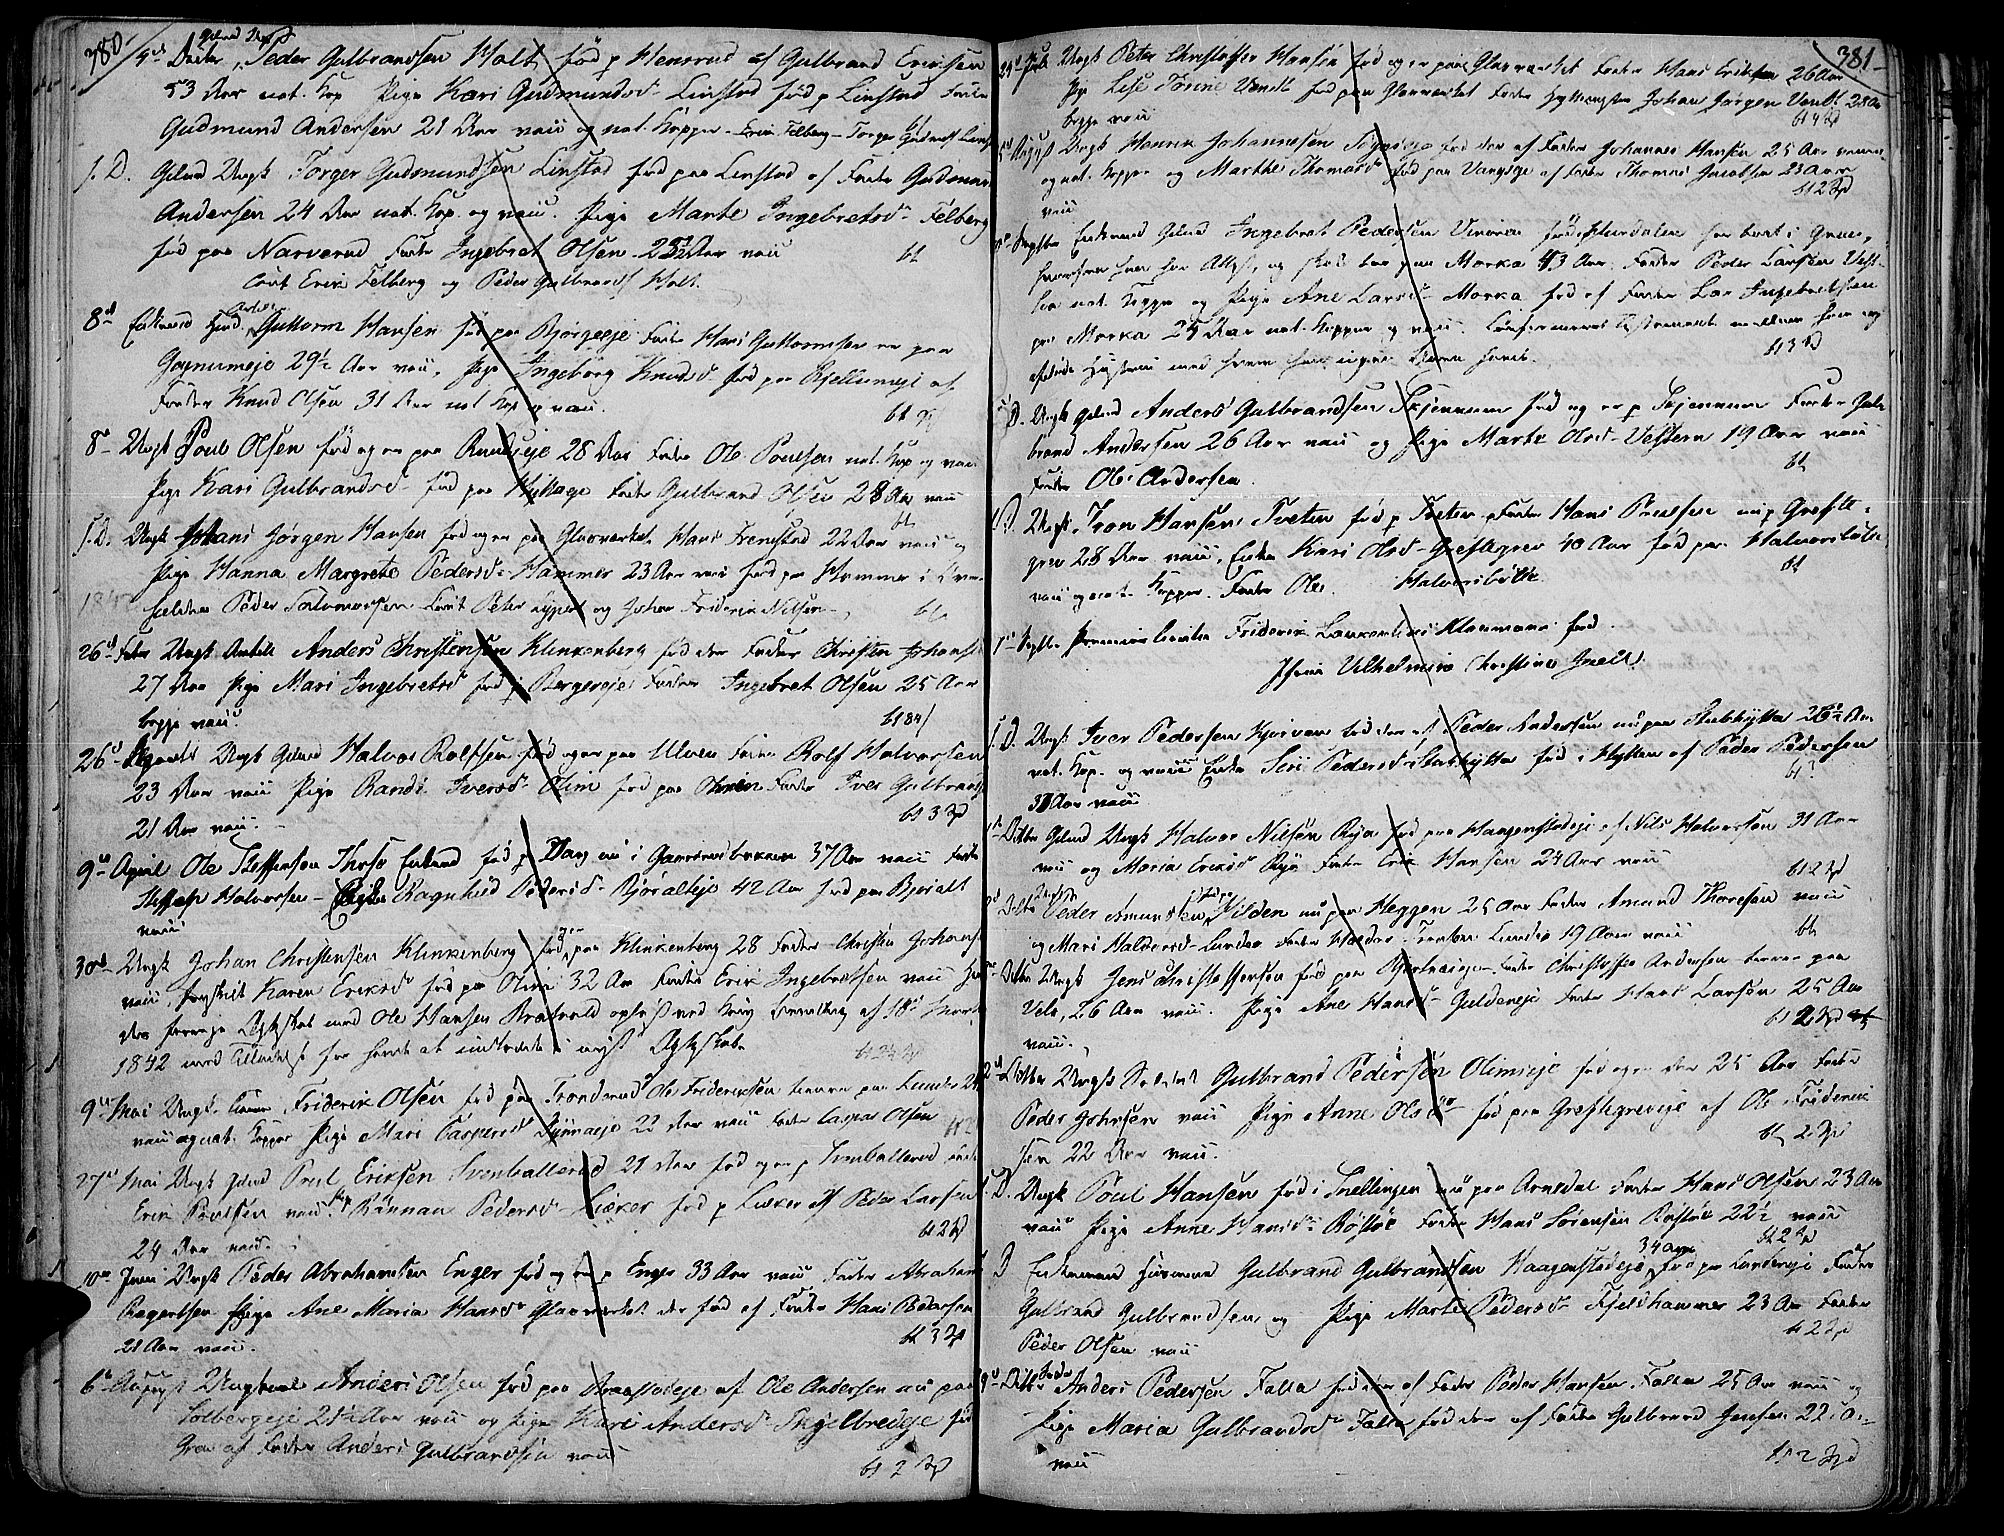 SAH, Jevnaker prestekontor, Ministerialbok nr. 4, 1800-1861, s. 380-381